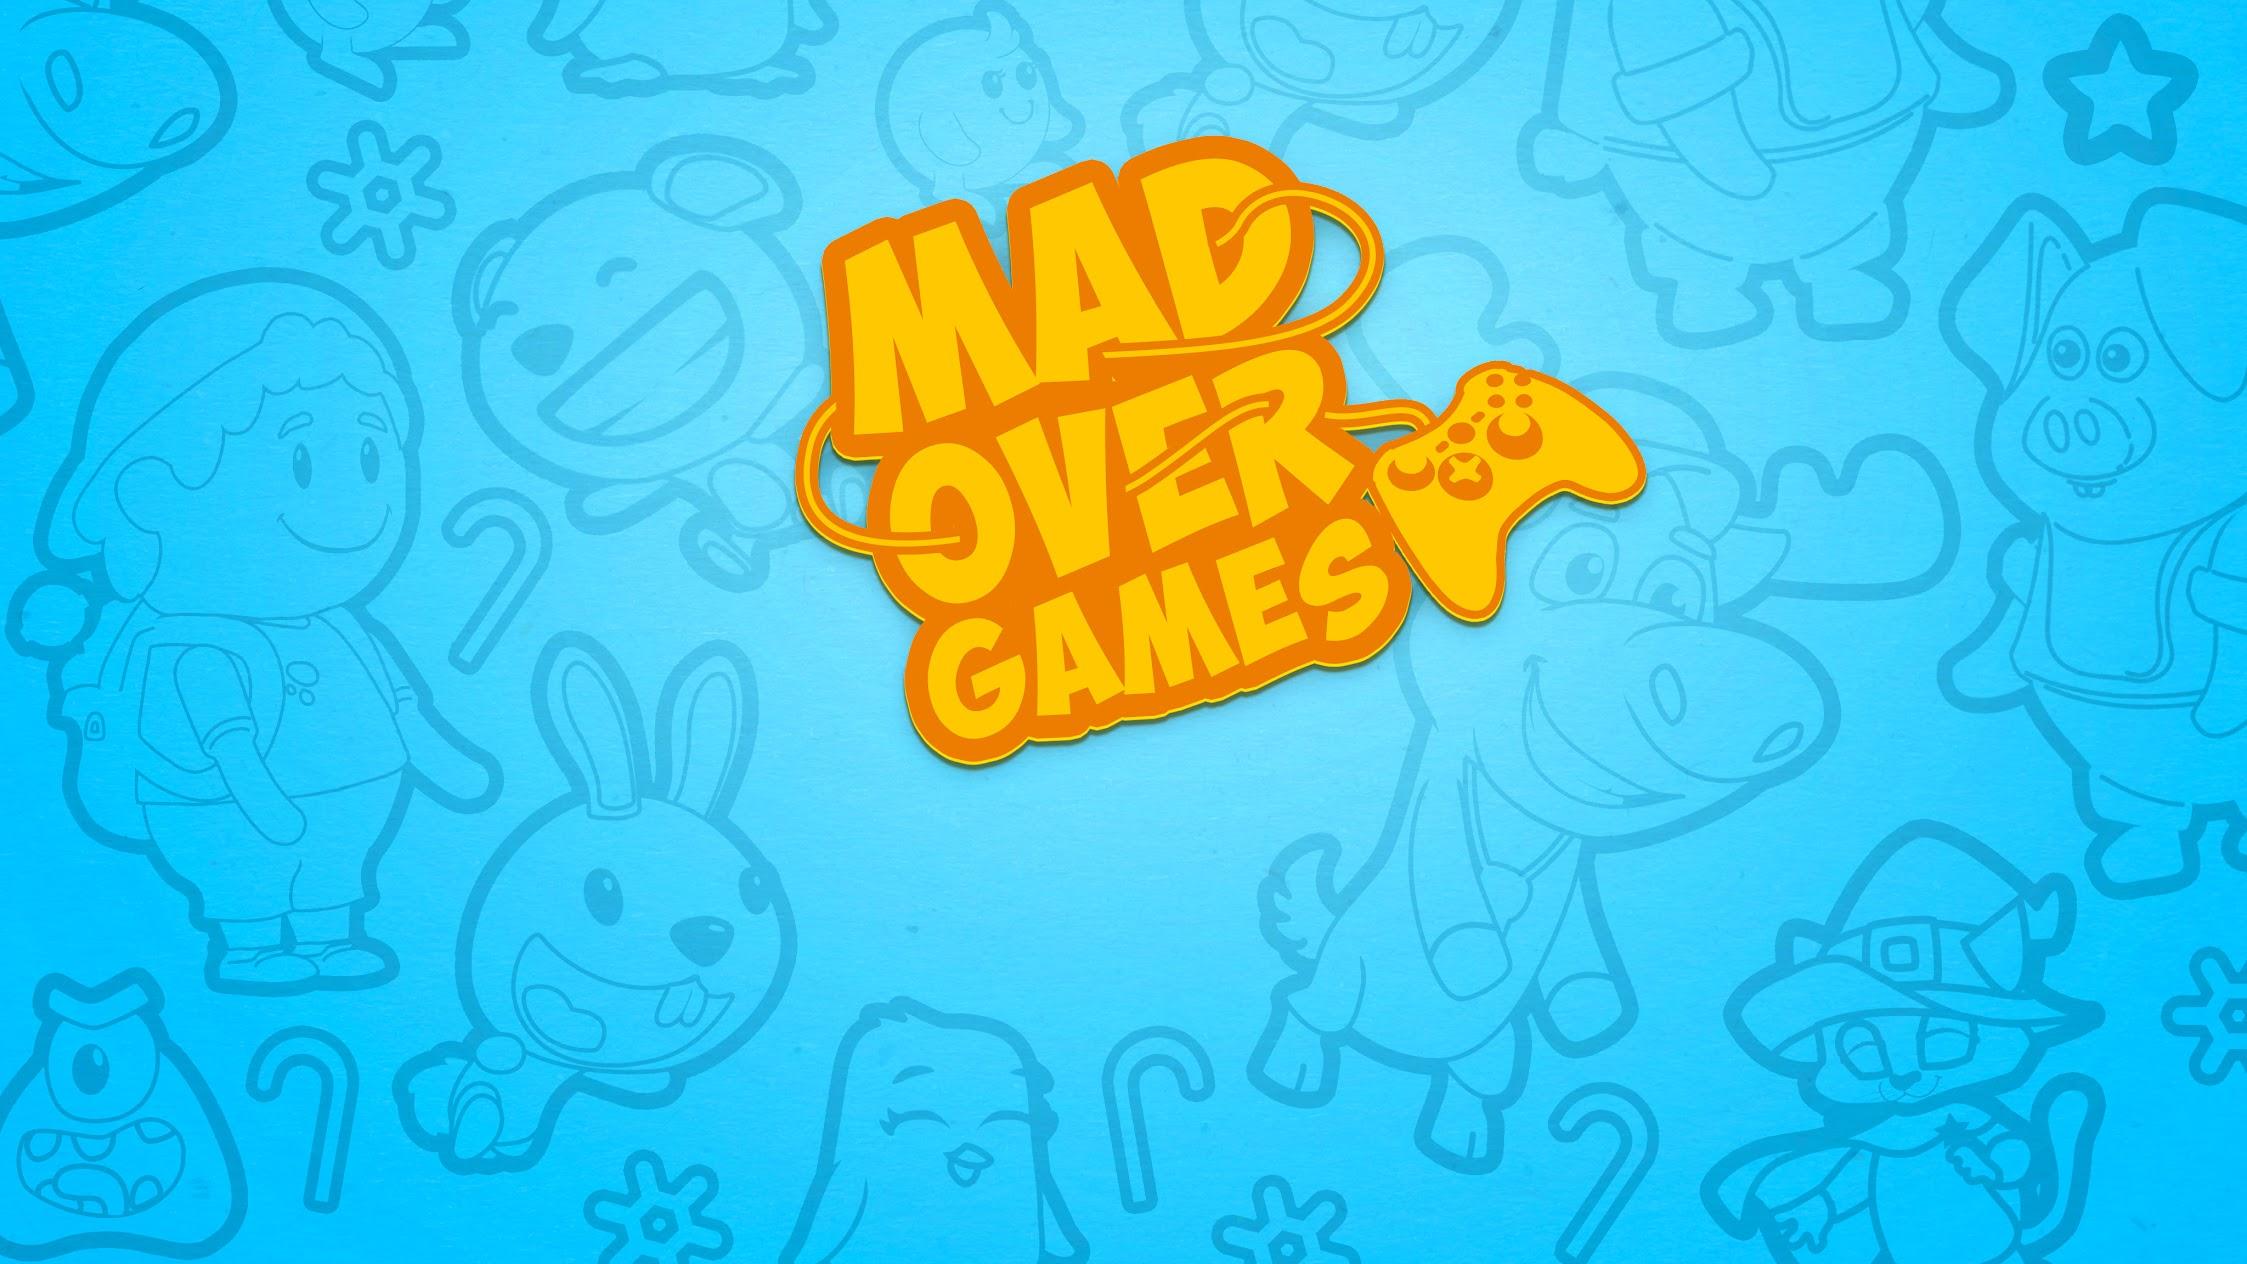 MadOverGames